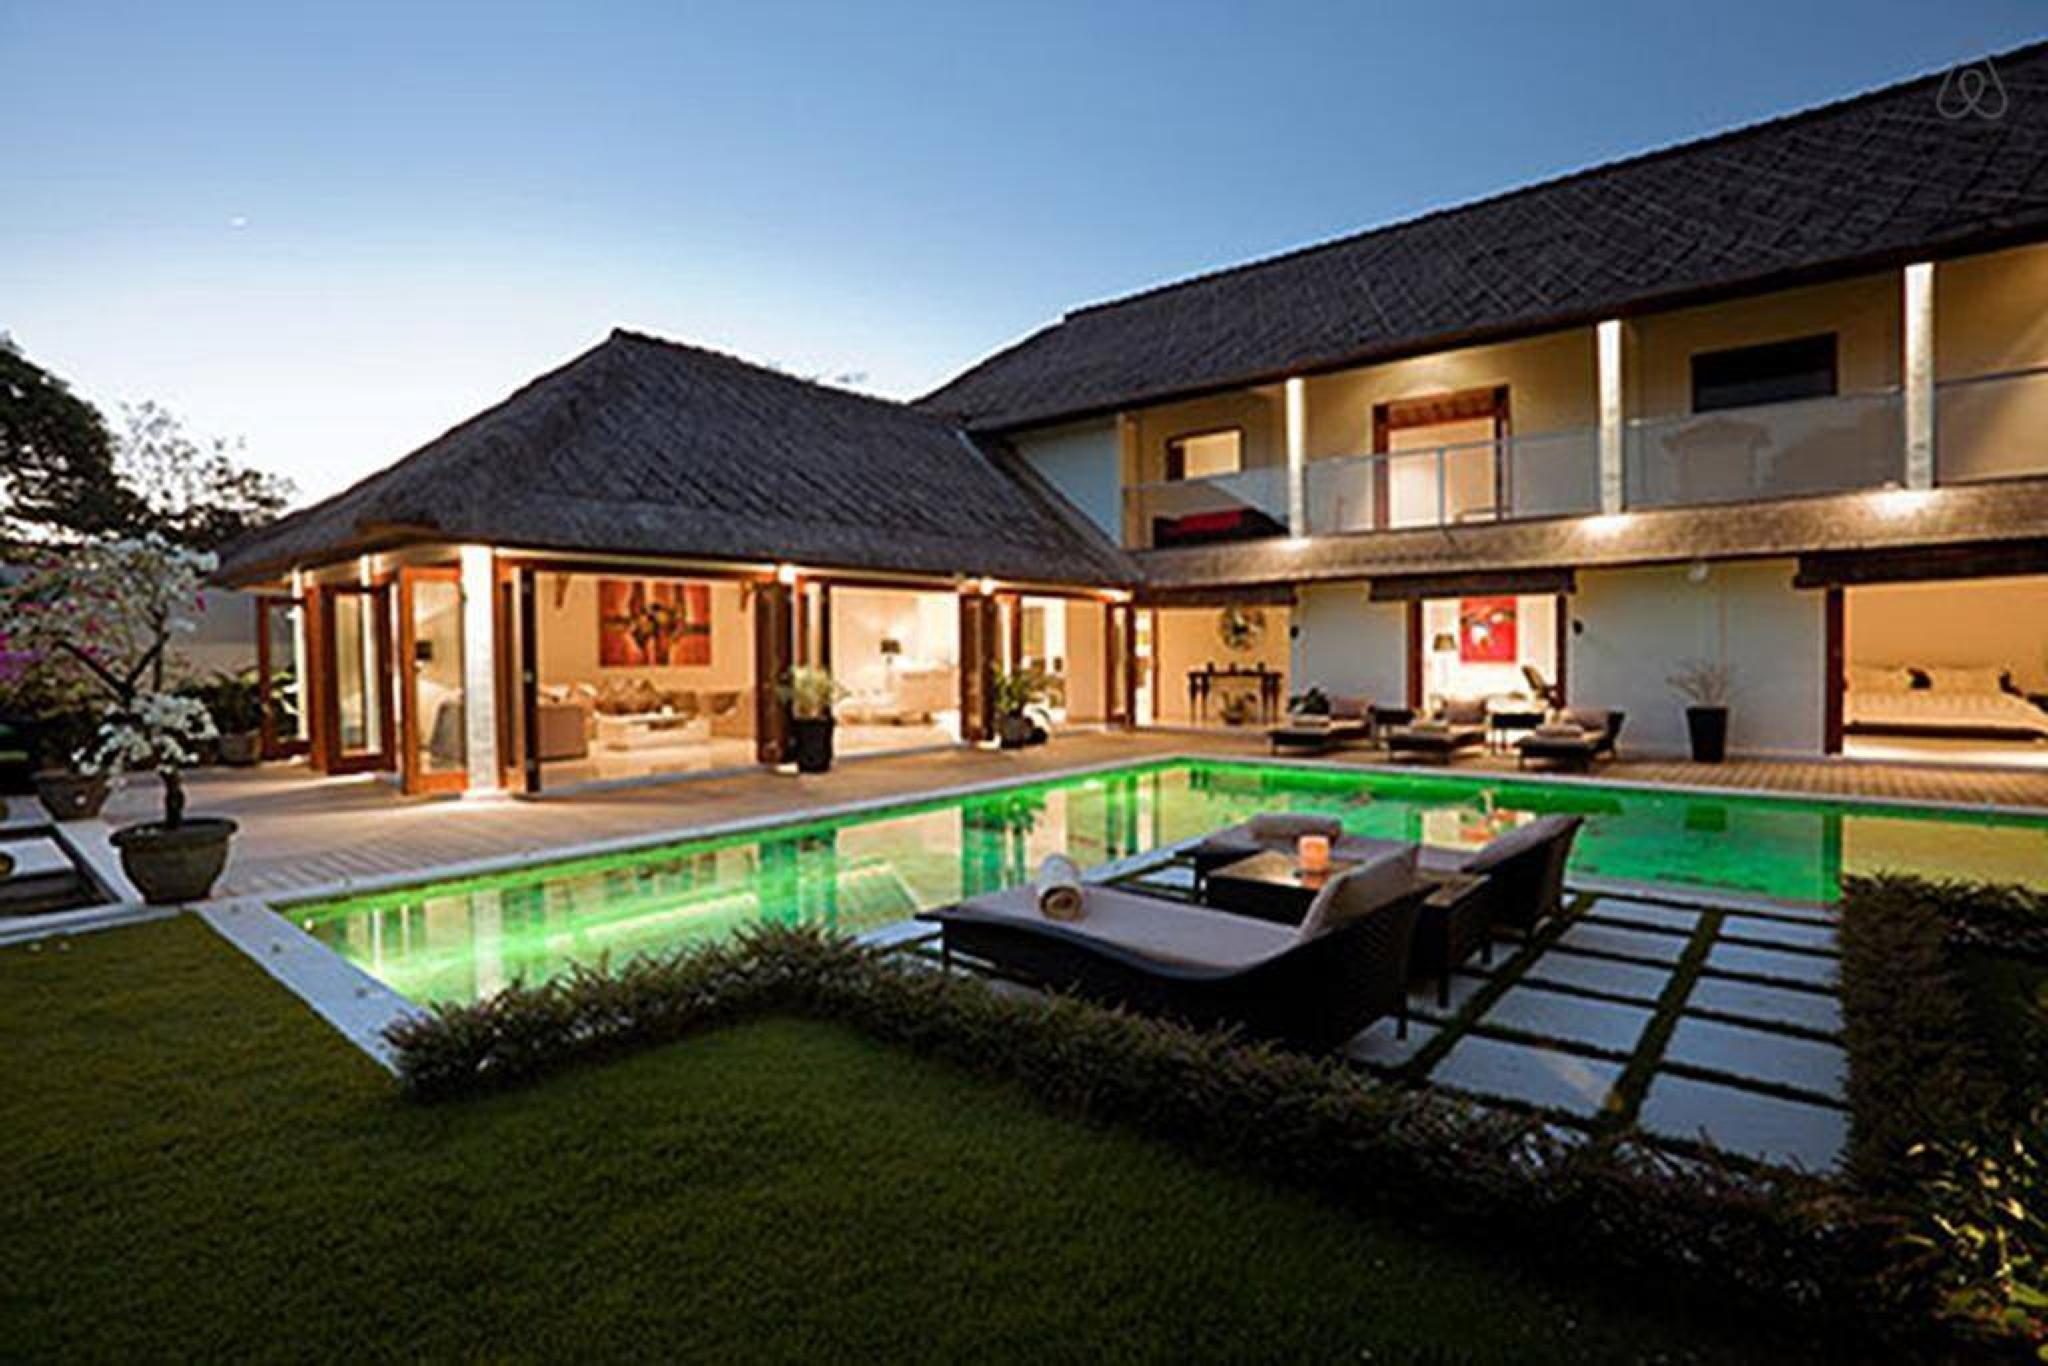 4 Bedroom Luxury Villa At Seminyak Promo